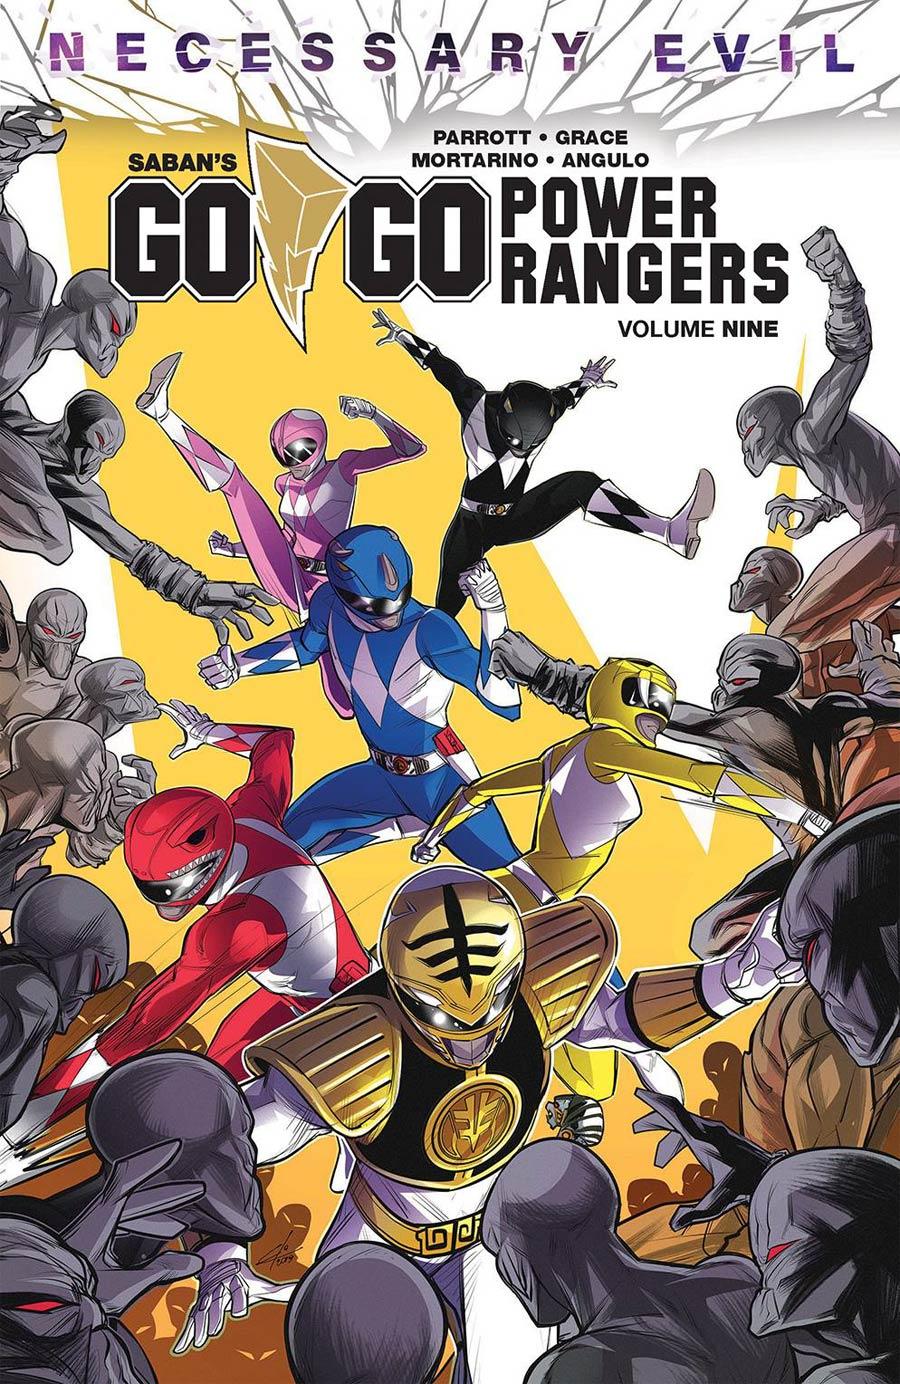 Sabans Go Go Power Rangers Vol 9 TP